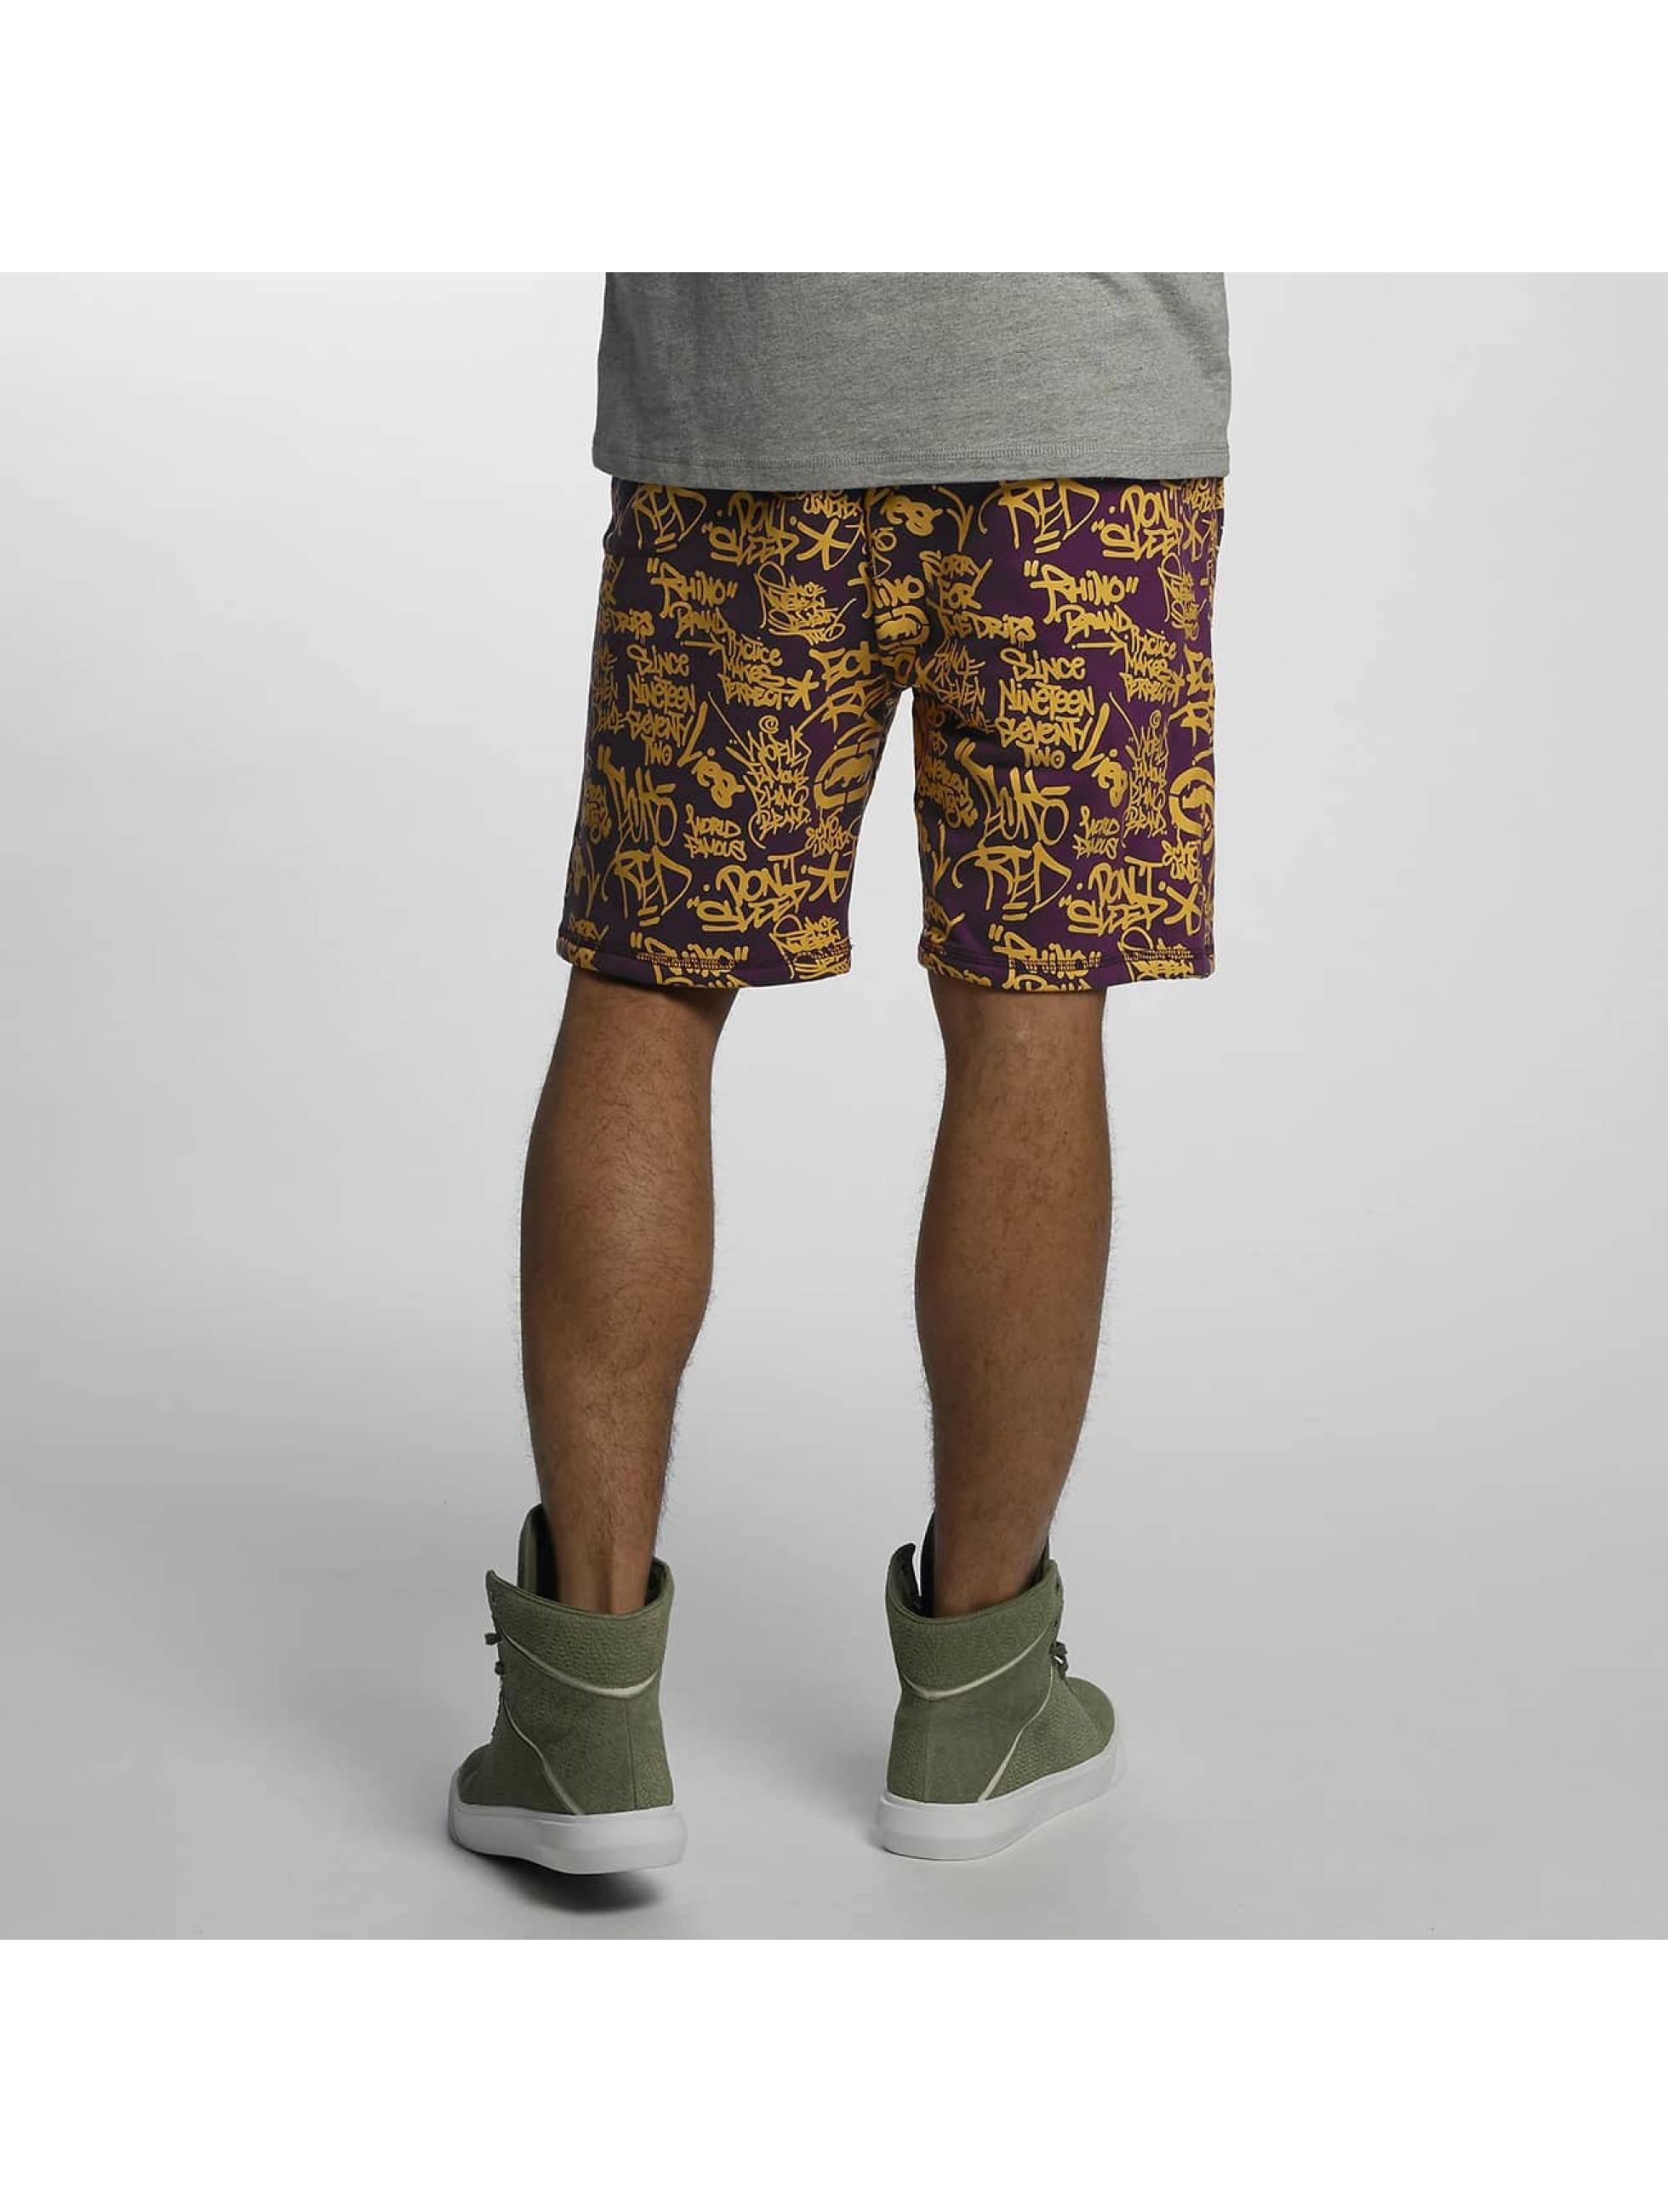 Ecko-Unltd-Uomini-Pantaloni-Shorts-Allover